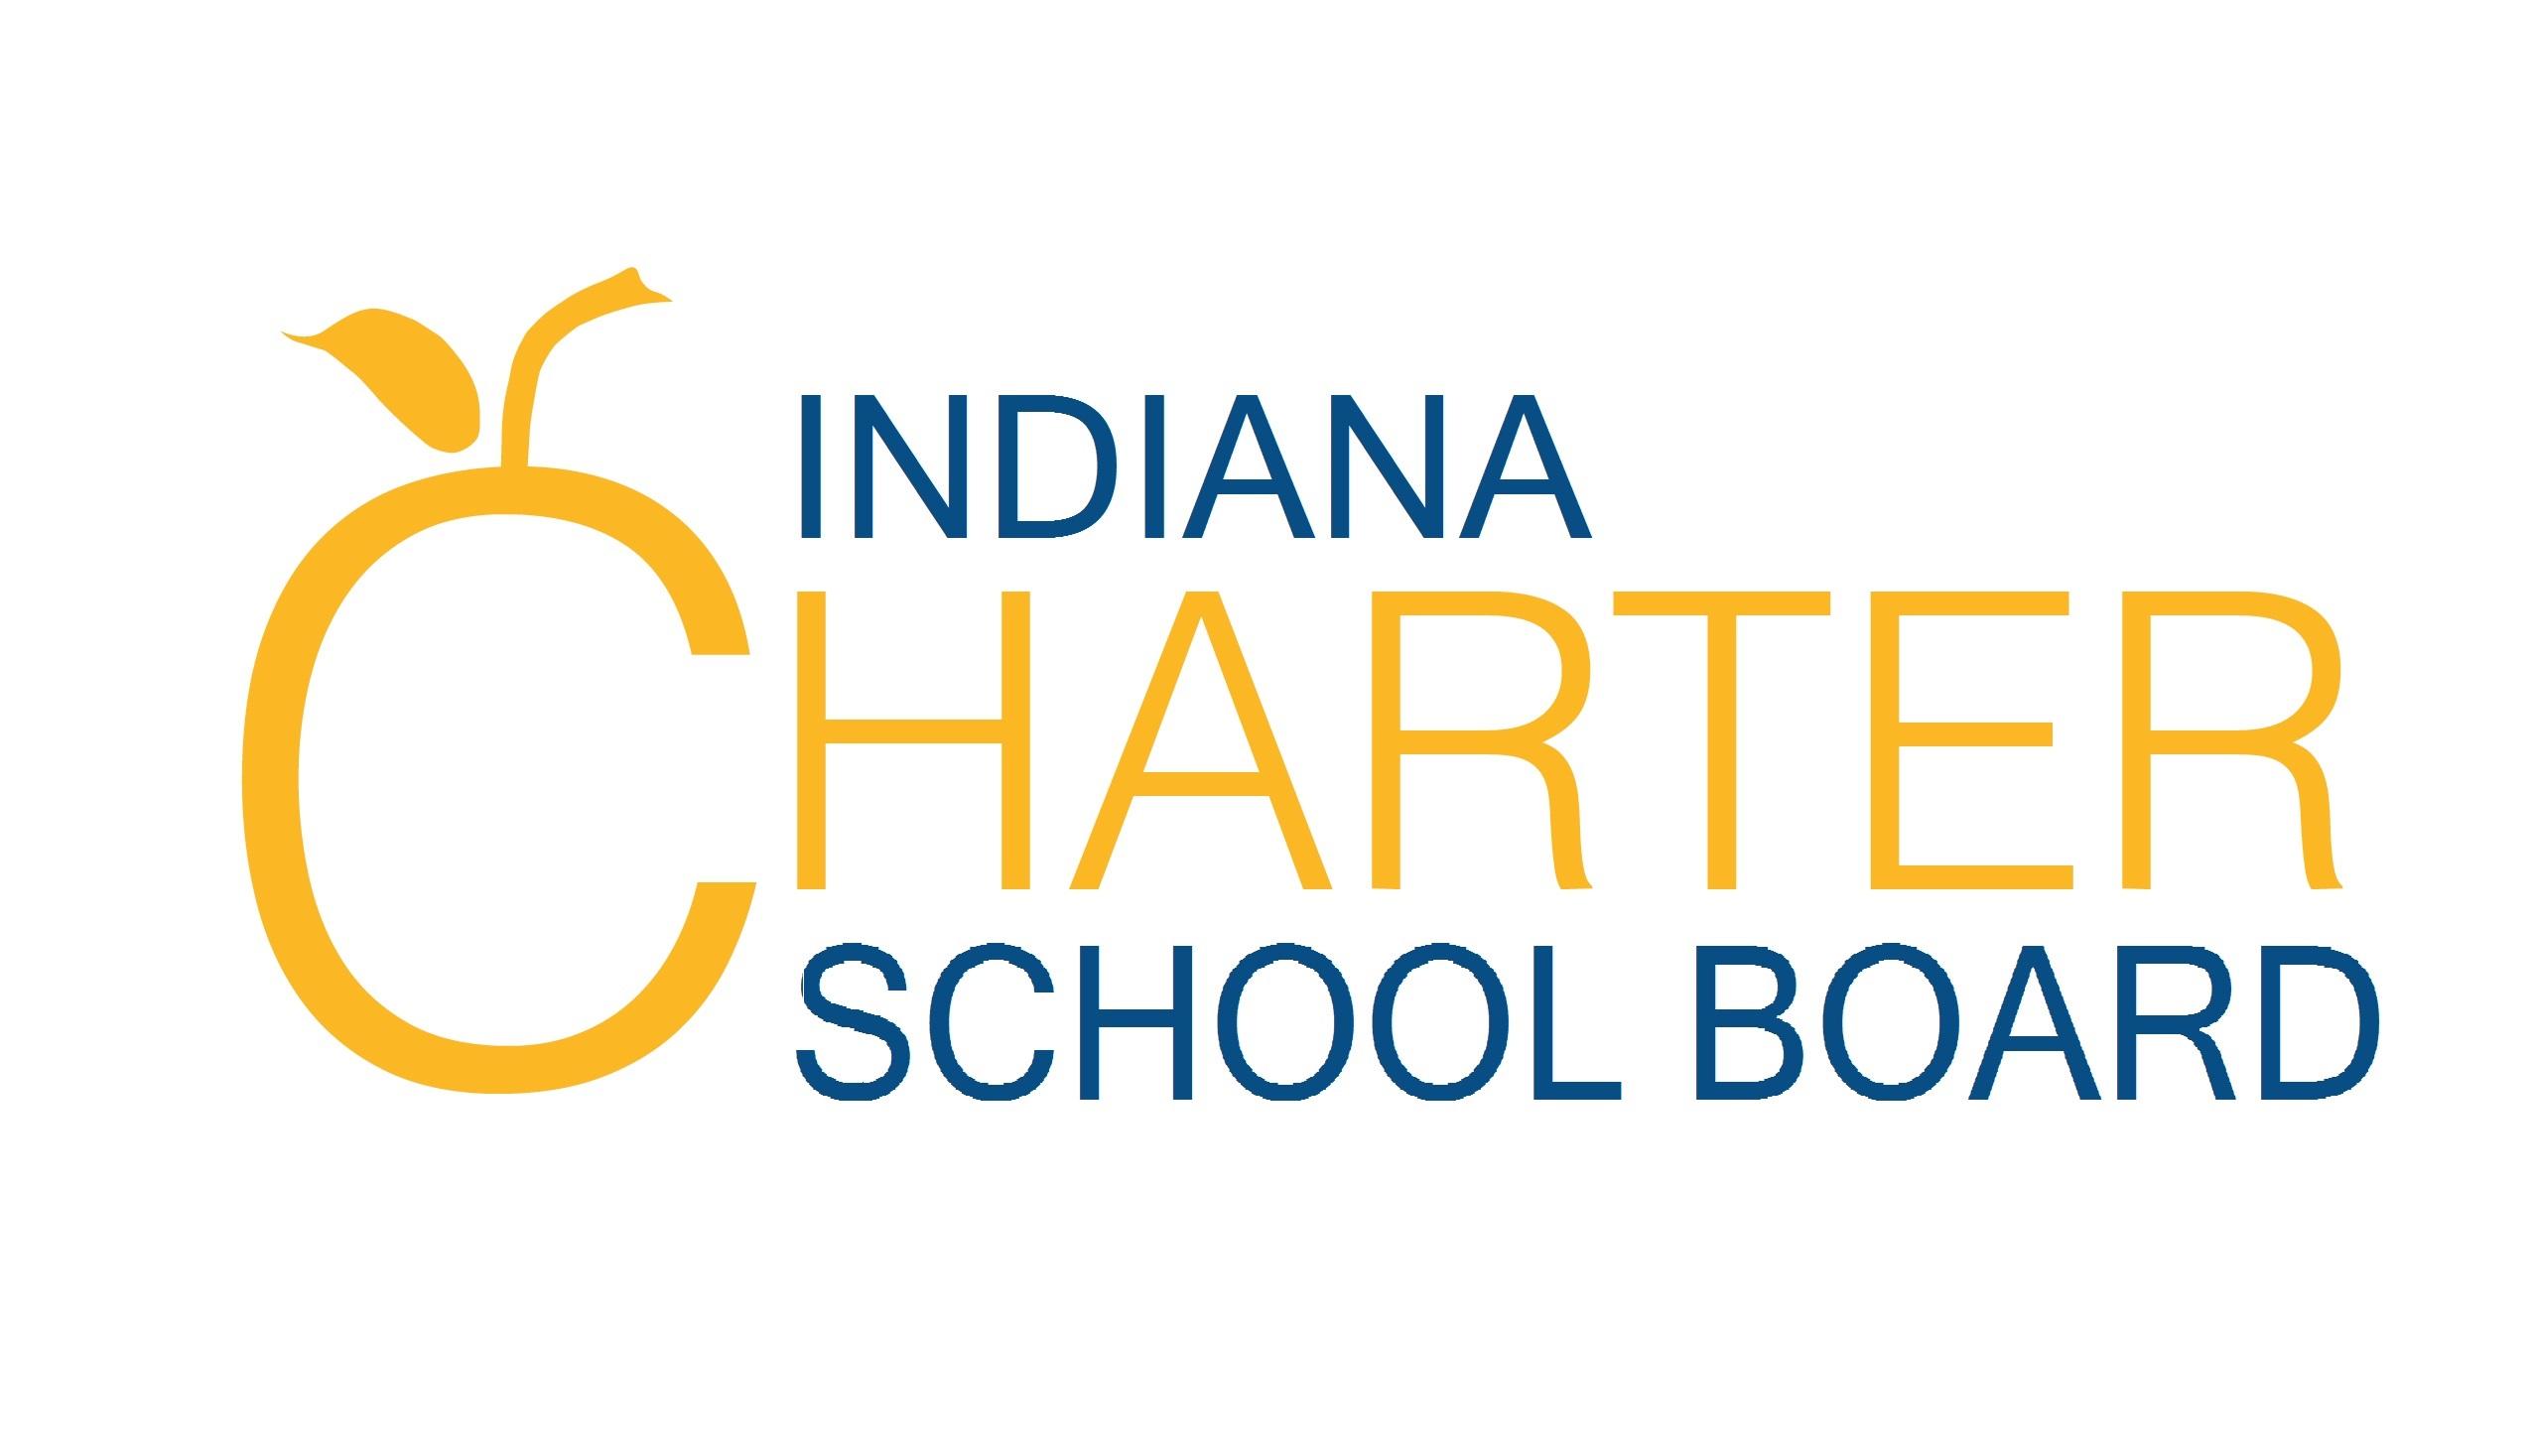 Indiana Charter School Board Logo